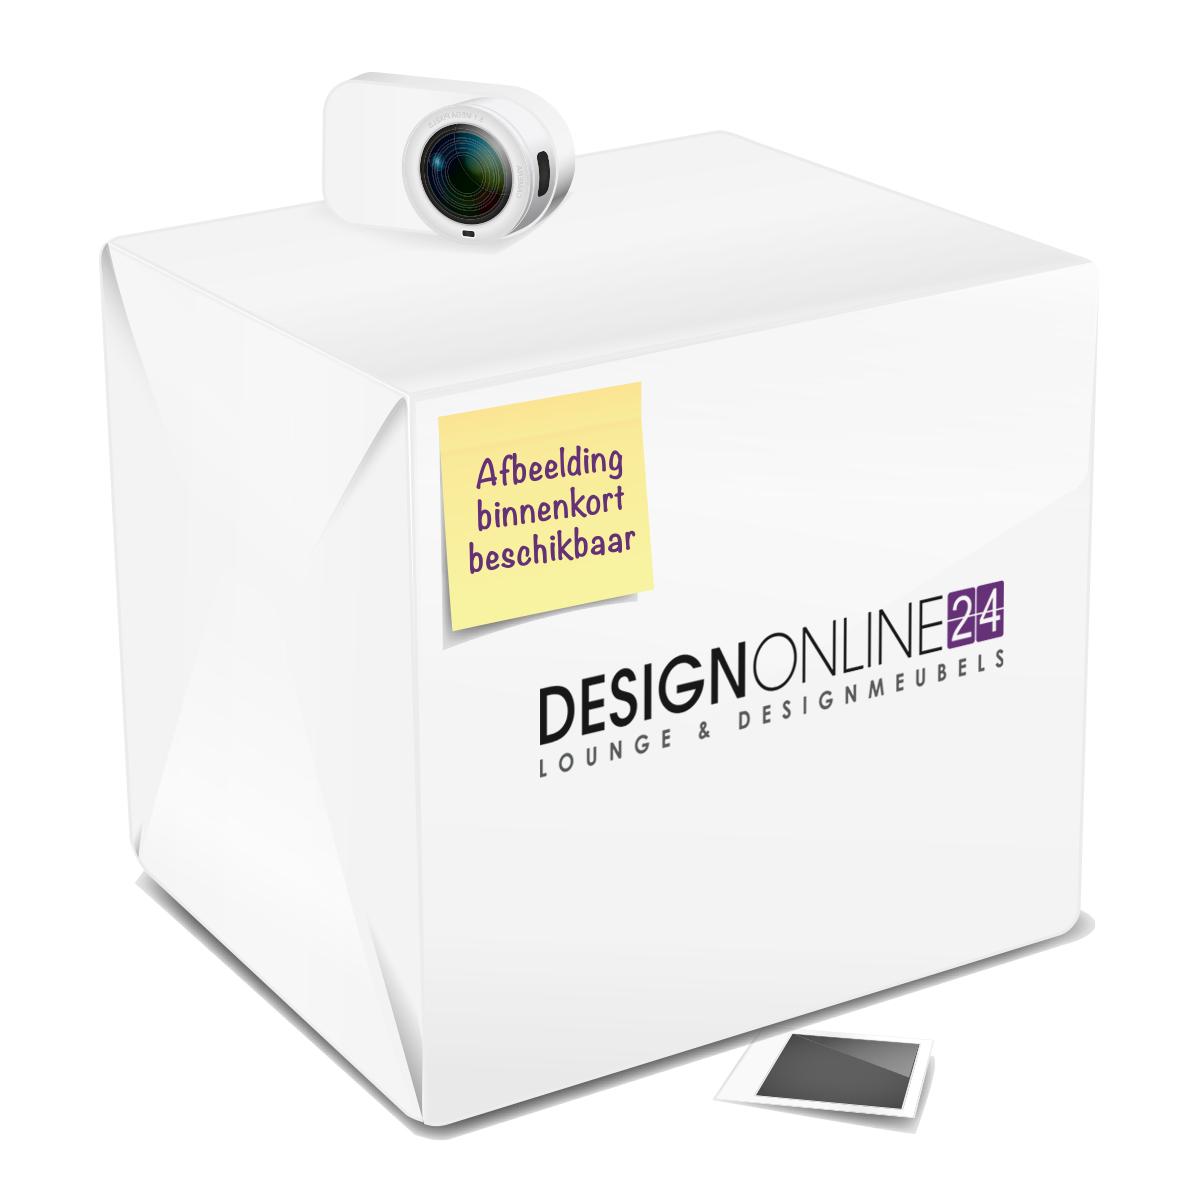 24Designs 24Designs Barkruk Maxime - Zithoogte 77 cm - Chromen onderstel - Kunstleren zitting - Blauw